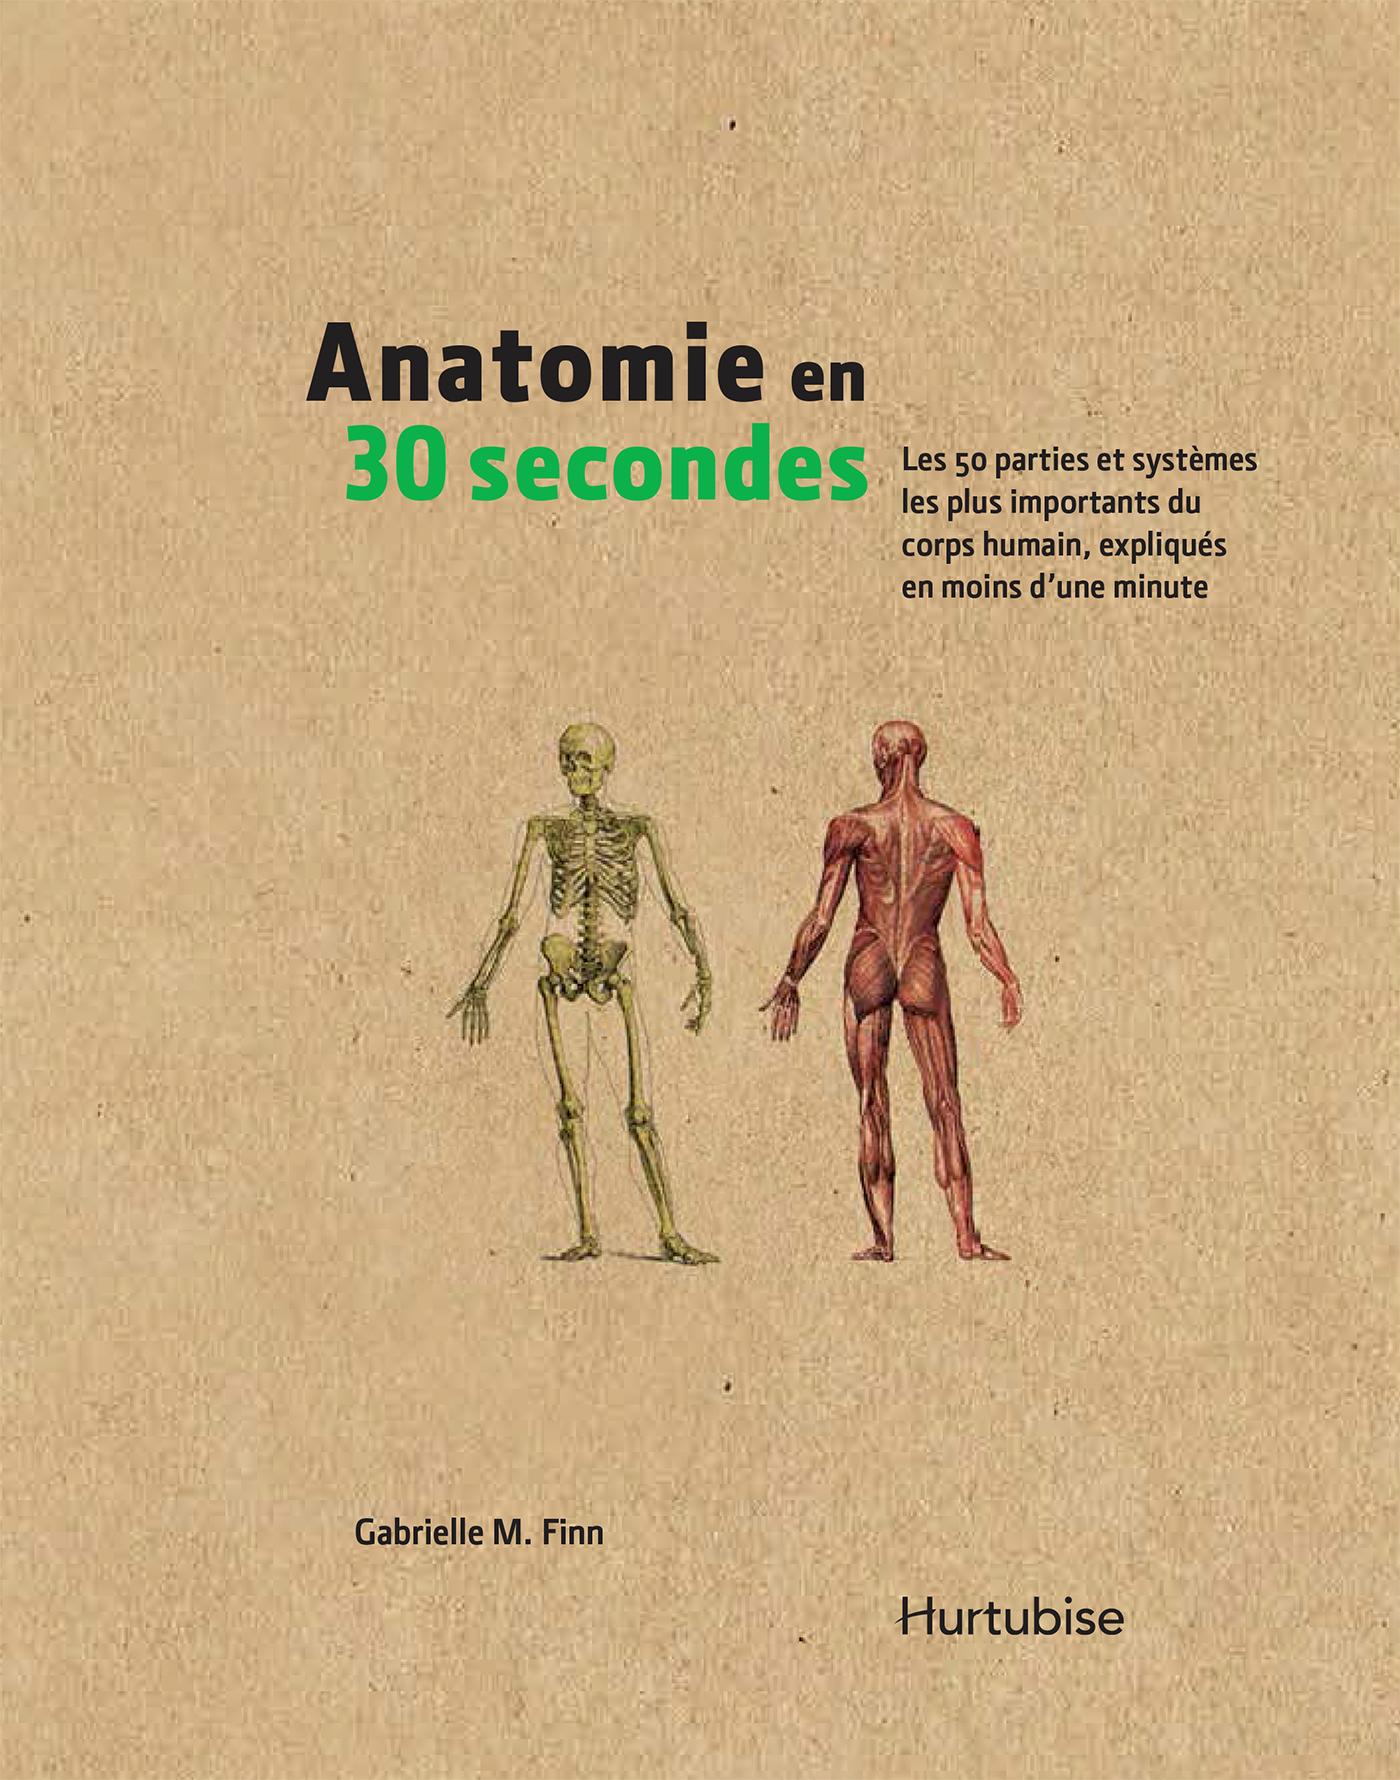 Anatomie en 30 secondes